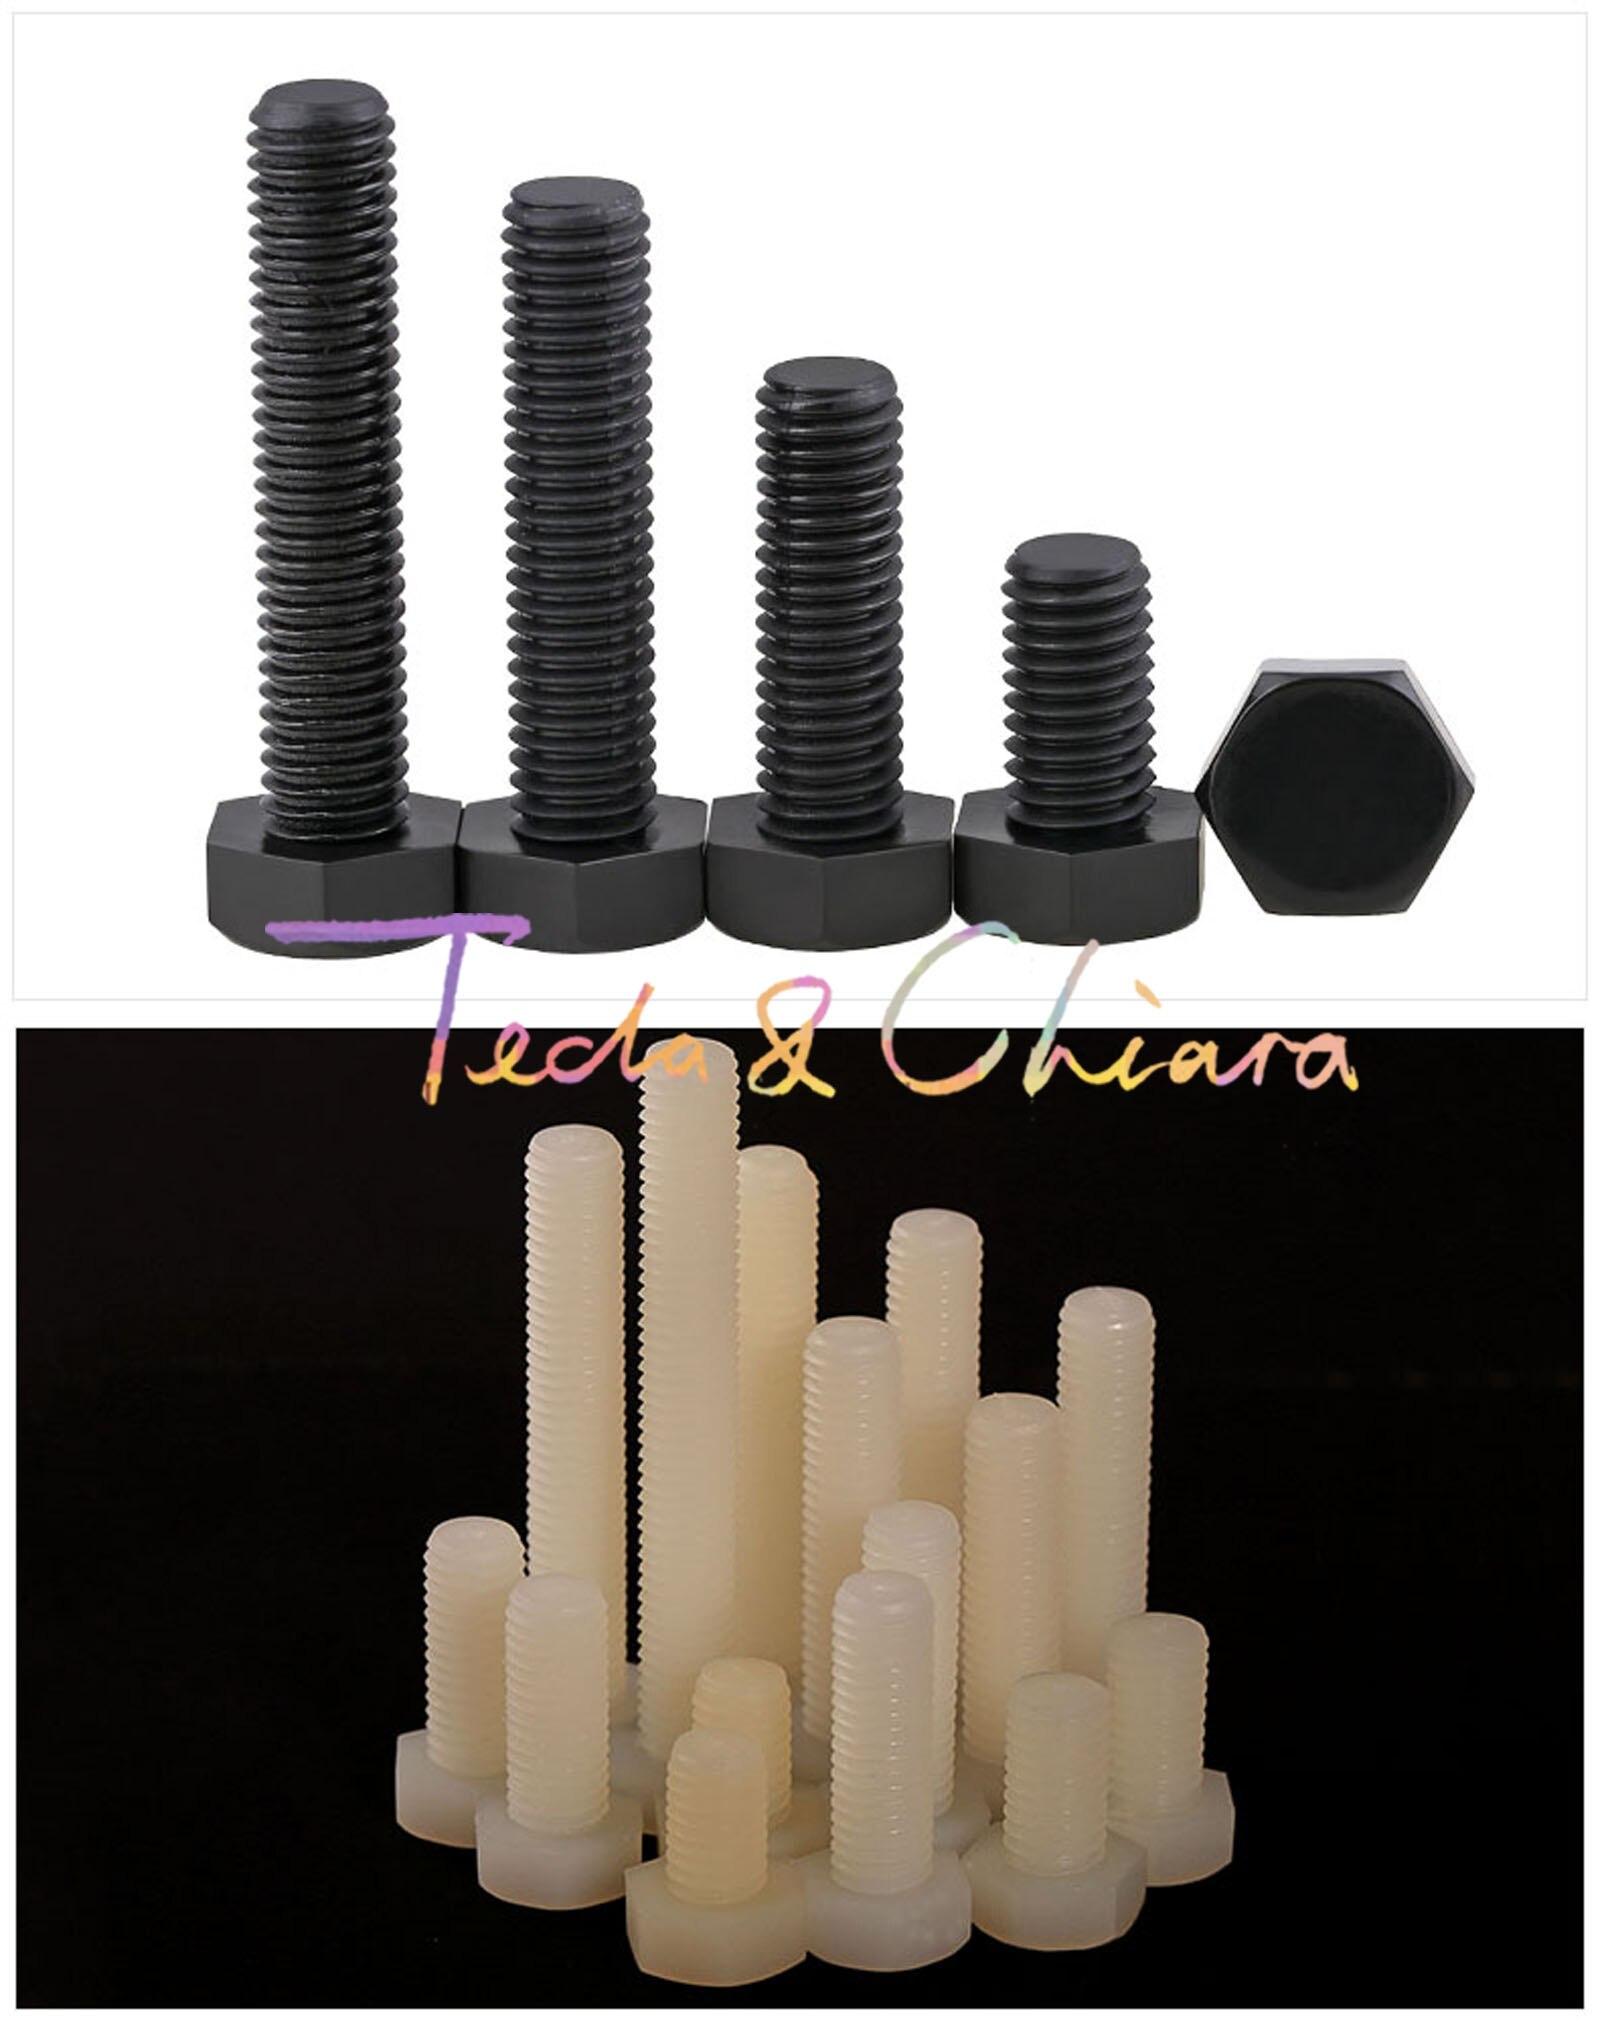 10 Uds M6 x 20mm nuevo L 20 blanco negro Nylon hexagonal cabeza Set tornillo aislamiento perno hexagonal plástico *